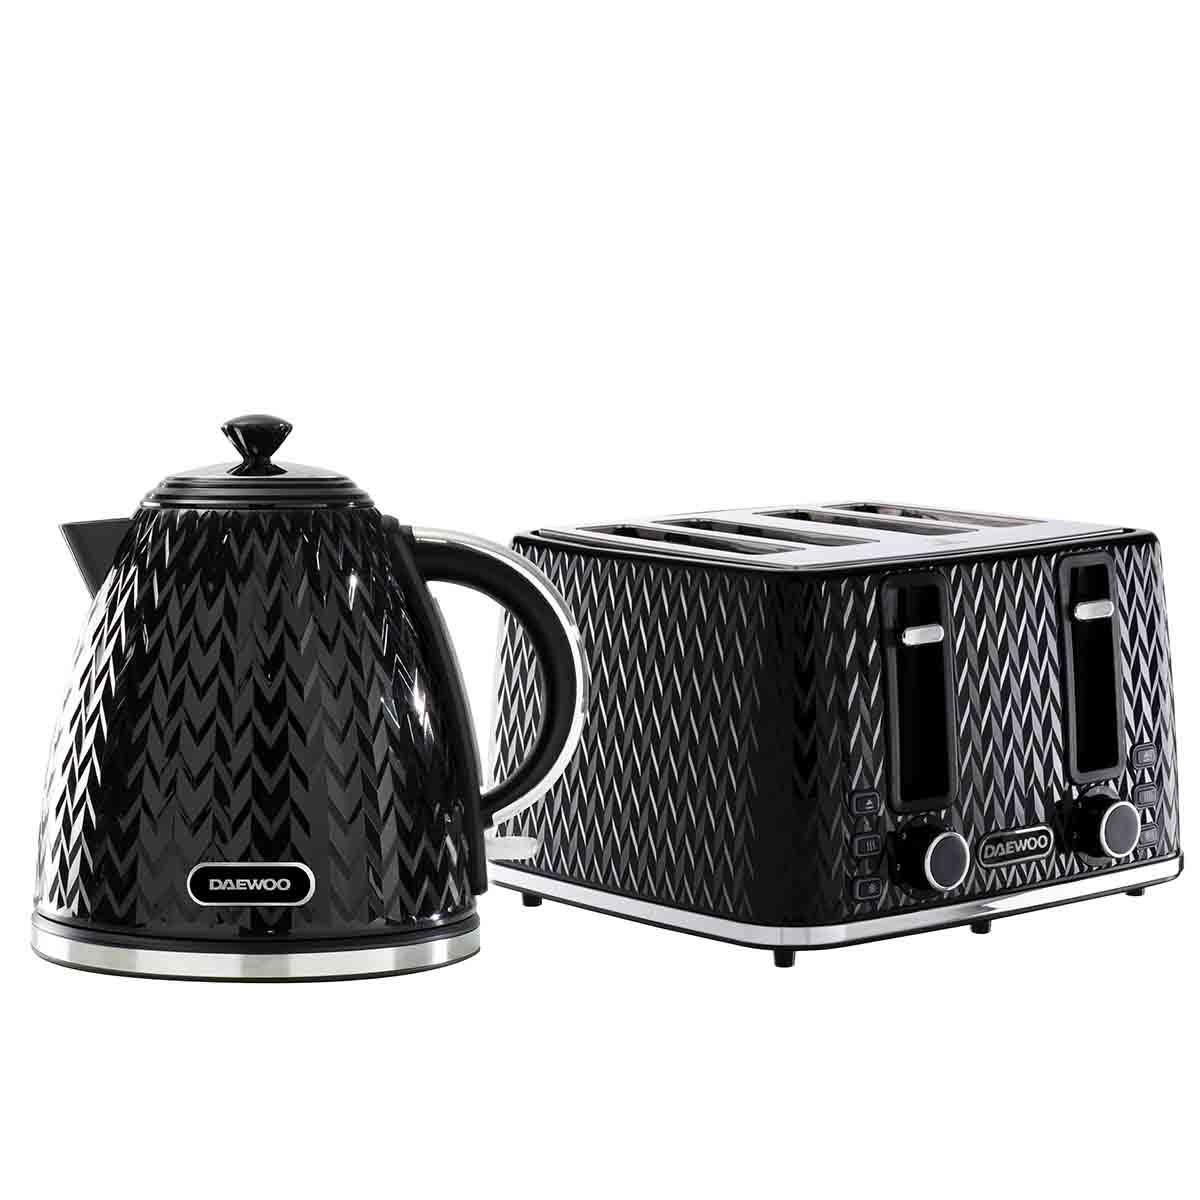 Daewoo SDA2388DS Argyle 1.7L 3KW Jug Kettle and 4 Slice Toaster Set - Black